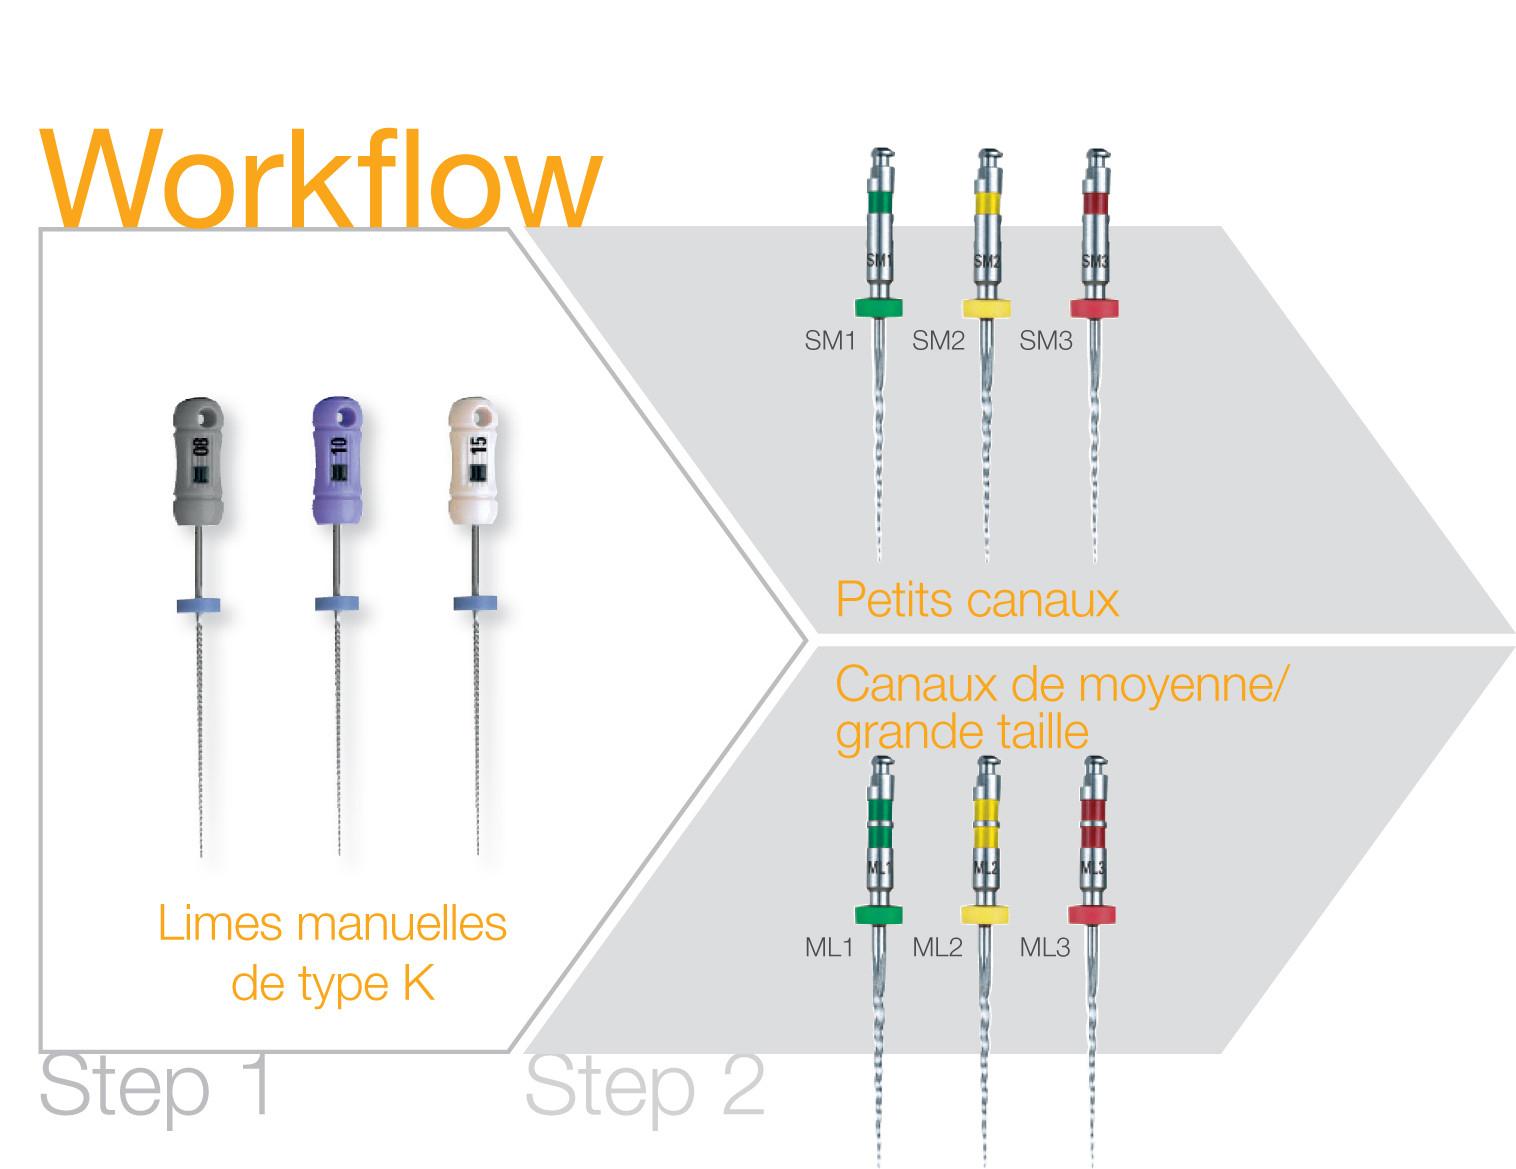 FR_Workflow